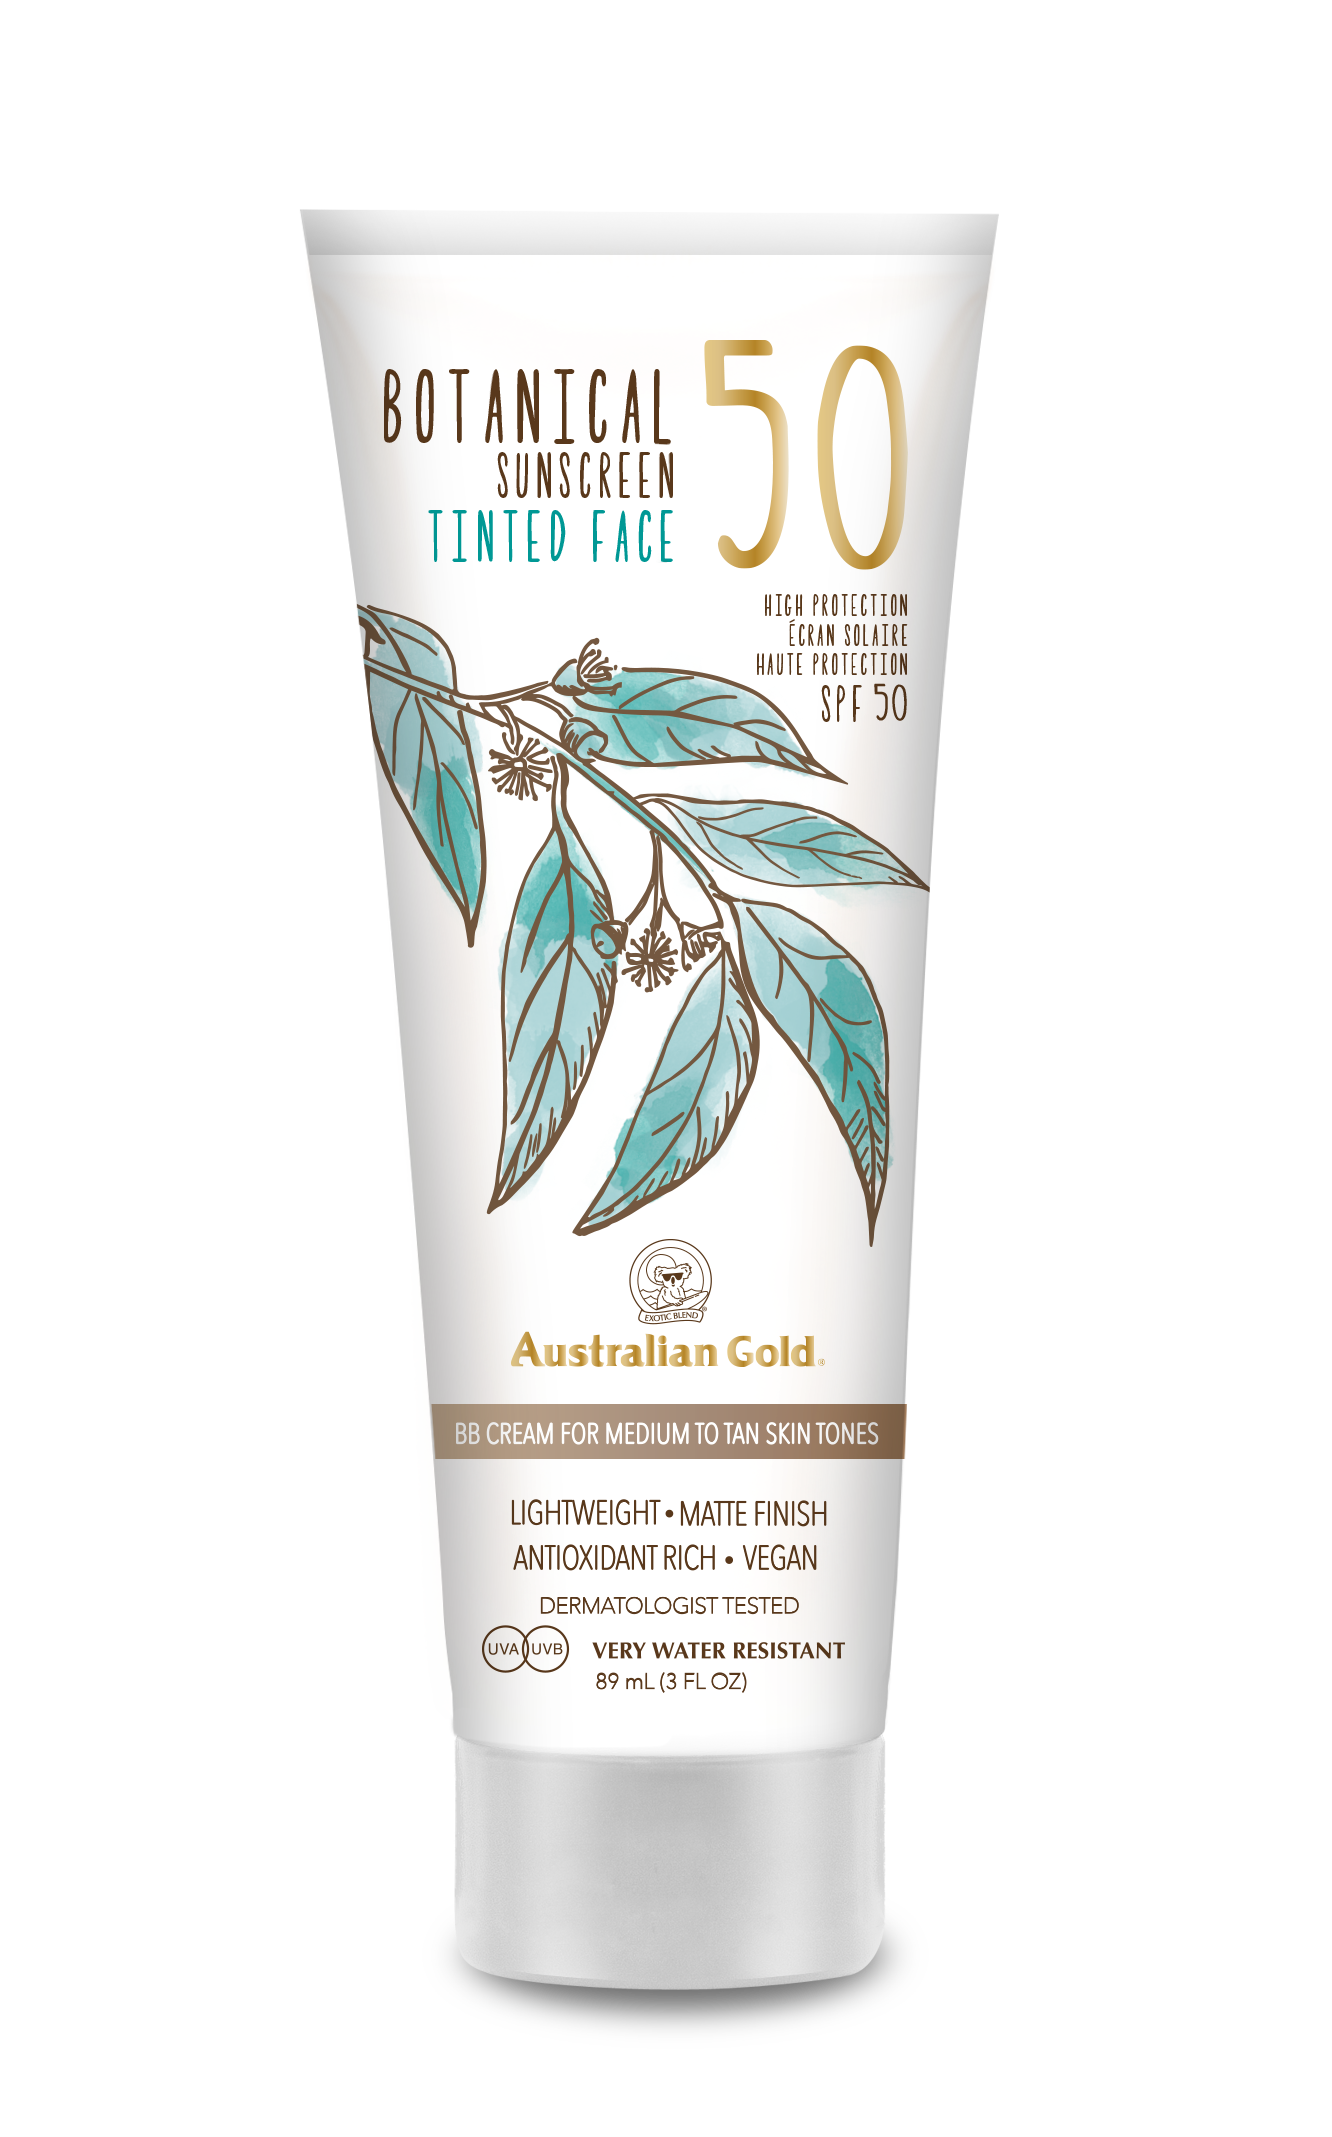 Australian Gold - Botanical Tinted Face Cream SPF 50 88 ml - Medium/Tan